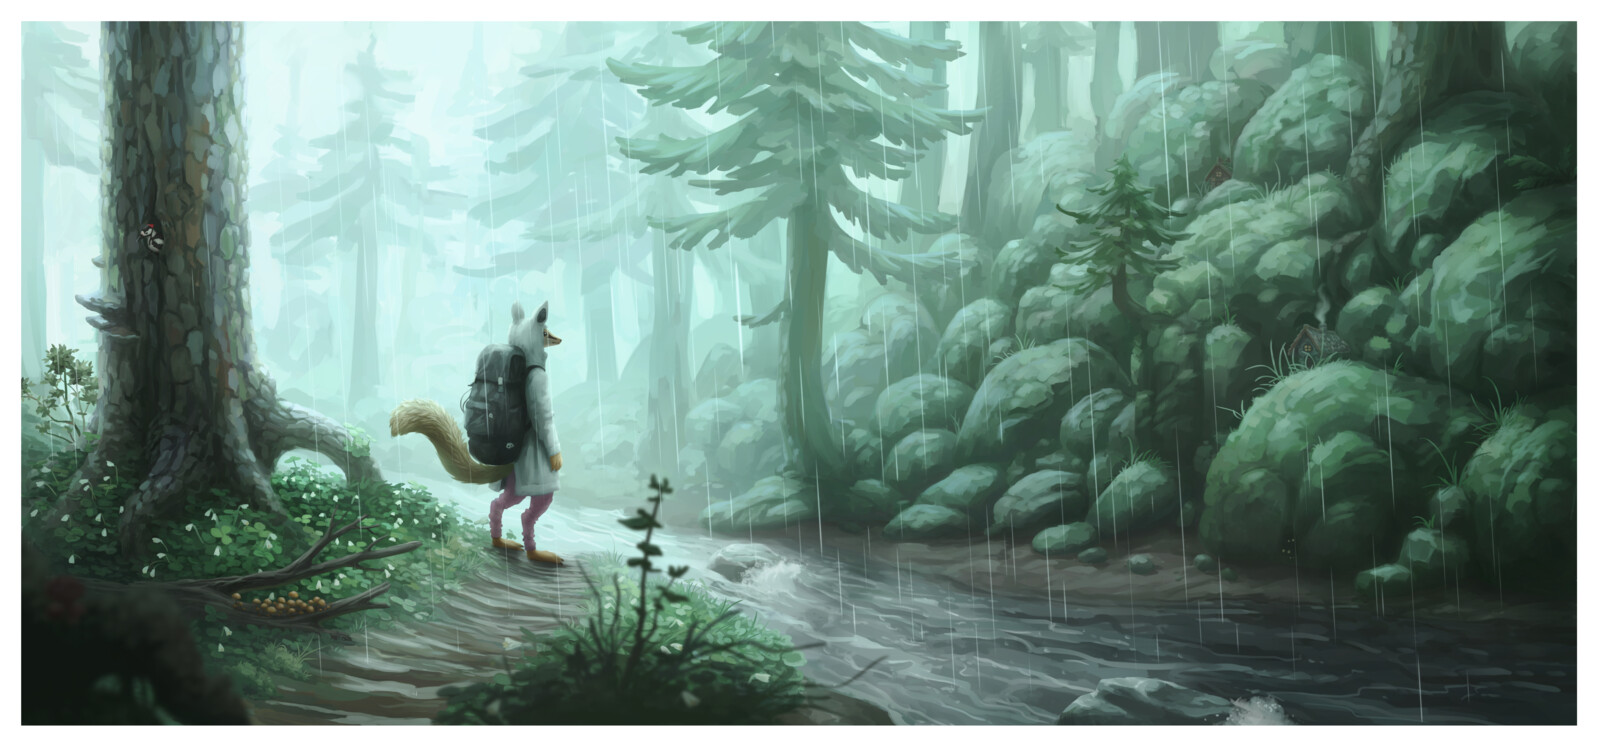 forest stream in the rain